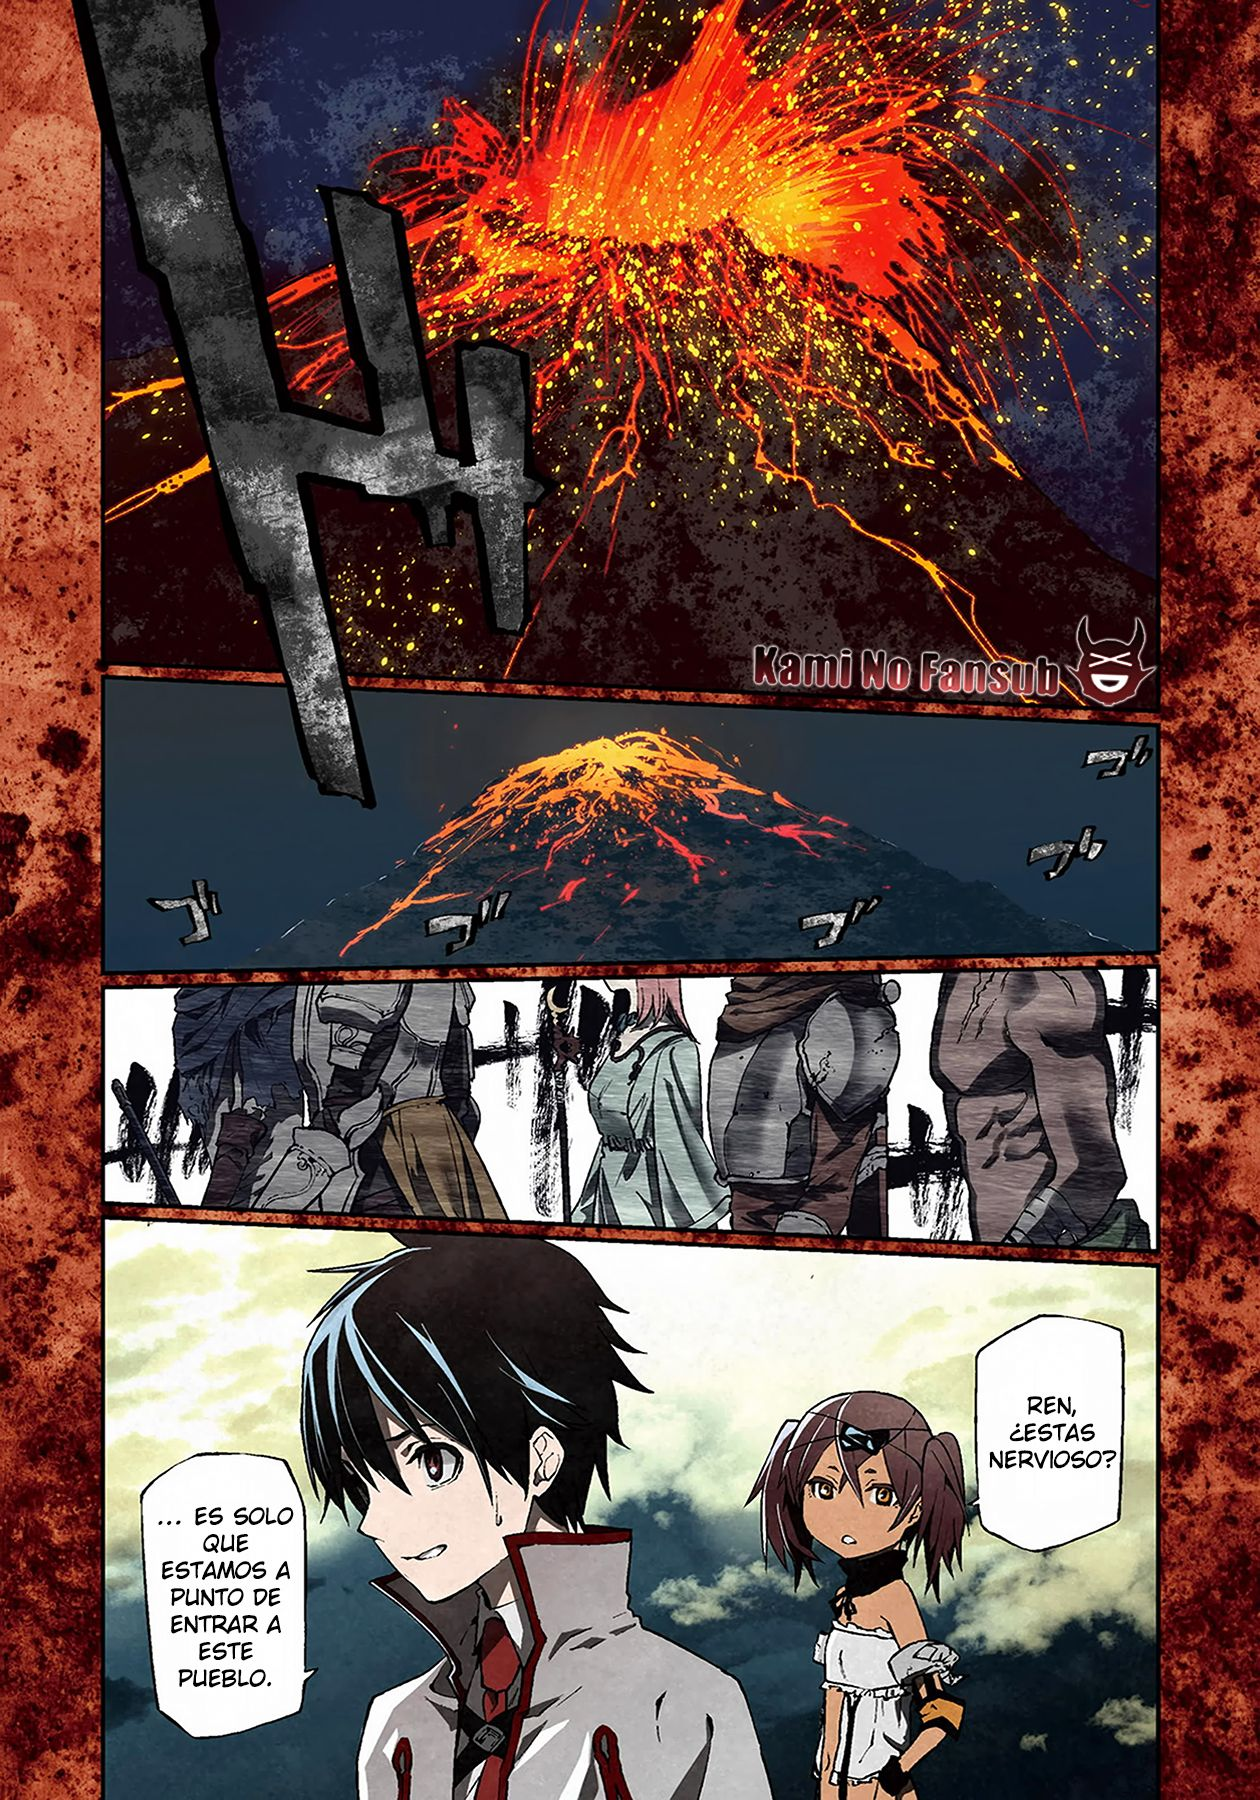 https://c5.ninemanga.com/es_manga/48/18352/459811/07c65274e2dae0d28d3dbe5edfbb5ecf.jpg Page 3